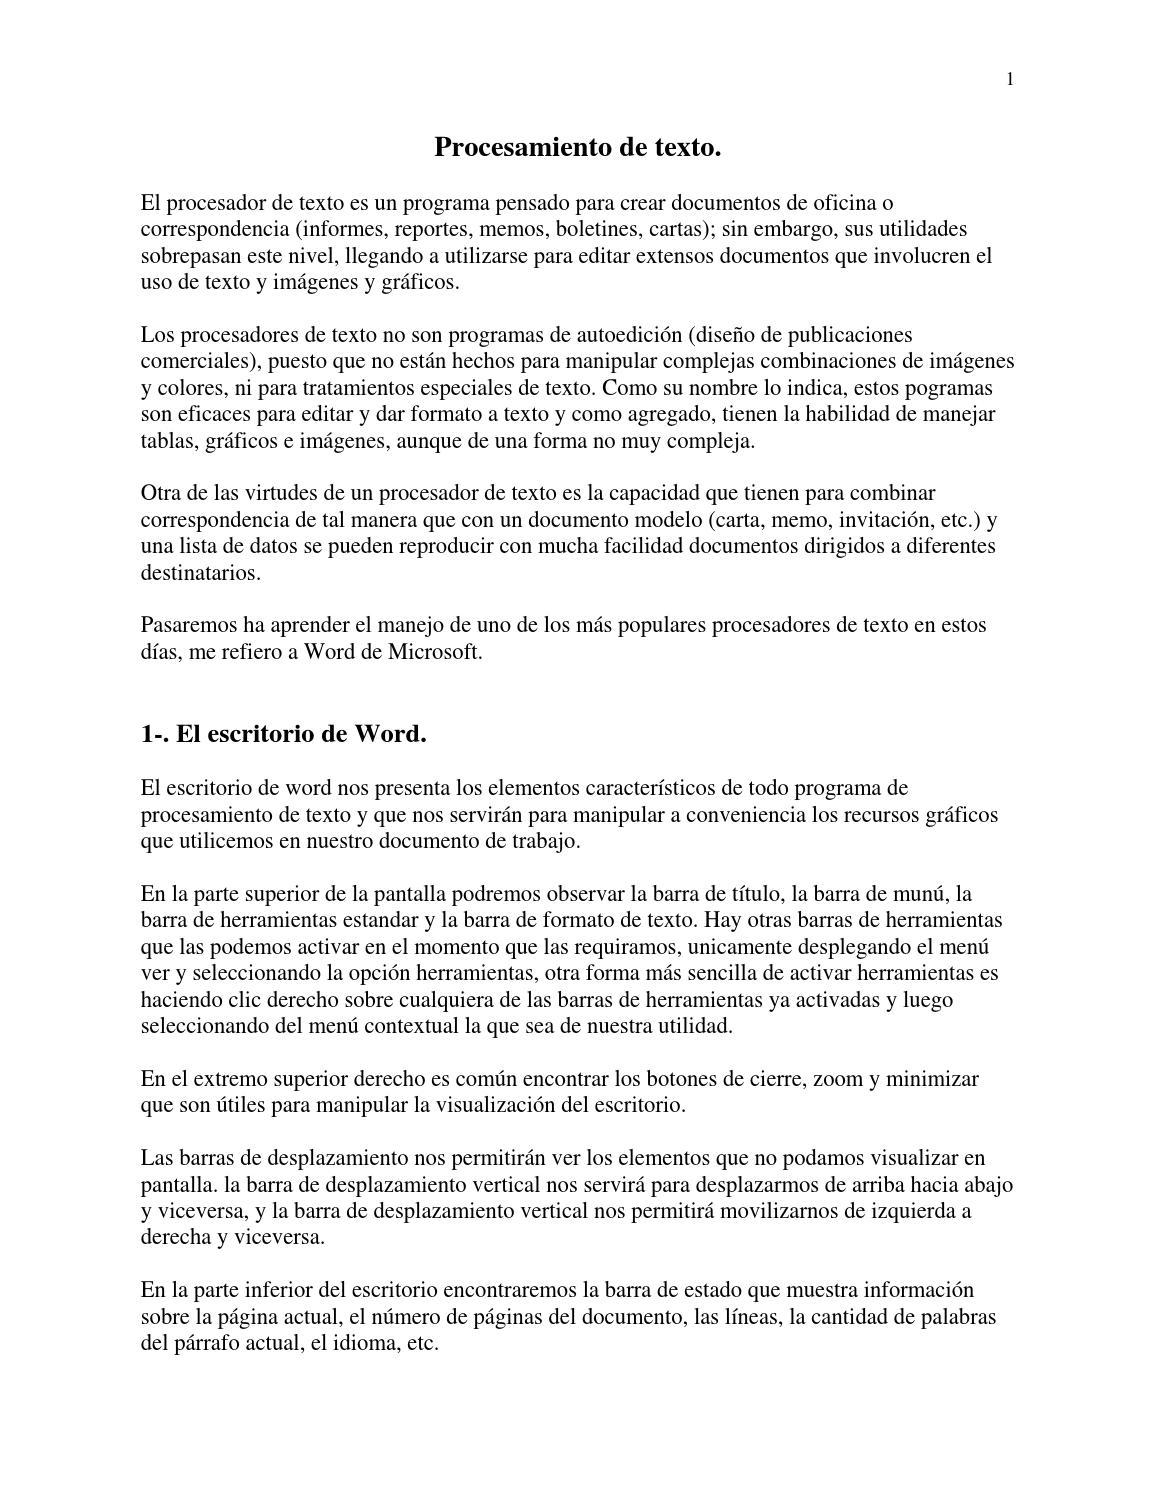 M5 l3 by Universidad Da Vinci - issuu